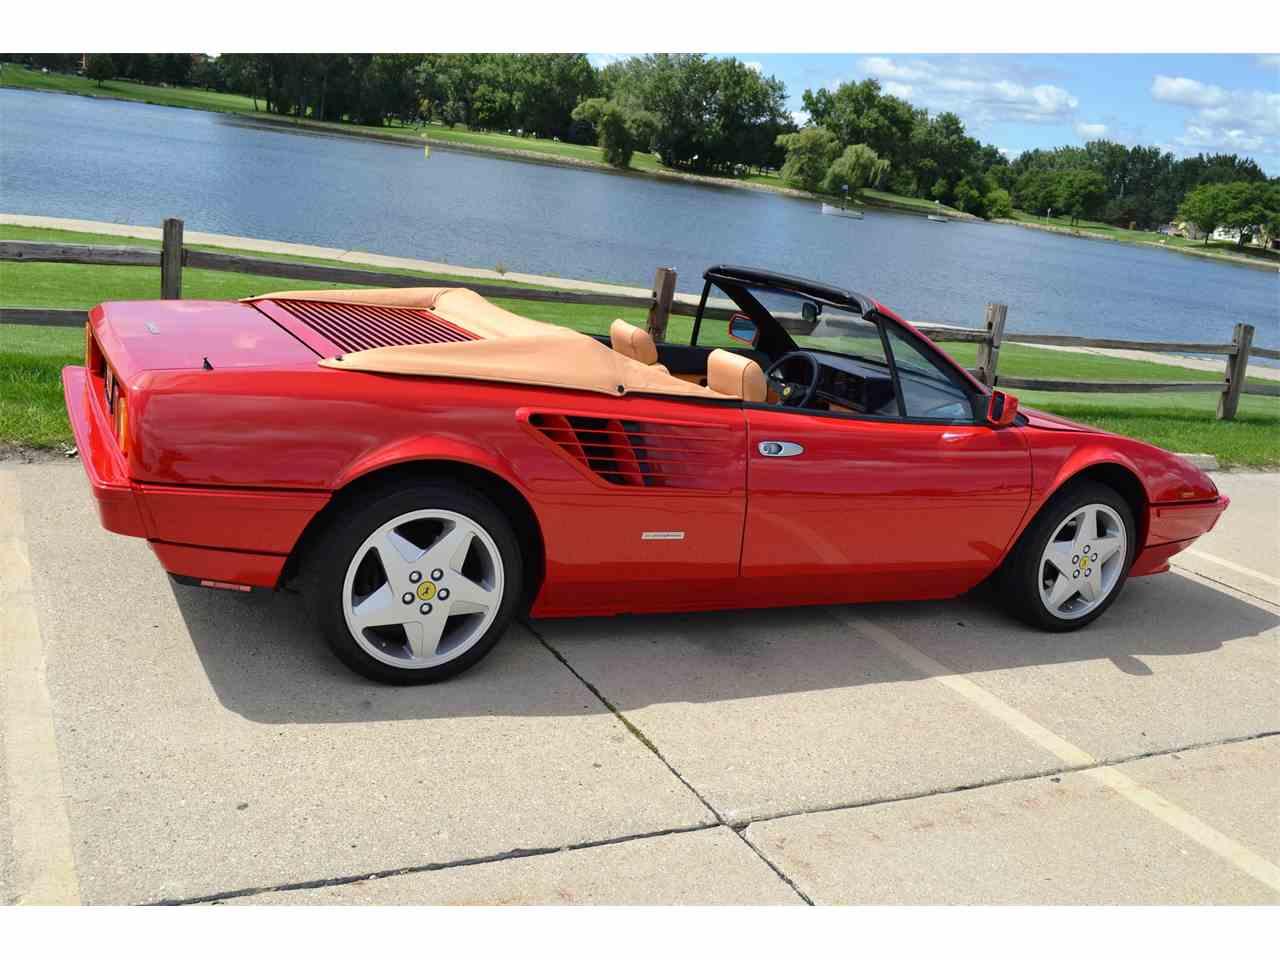 Large Picture of 1985 Ferrari Mondial located in Barrington Illinois - JOFL